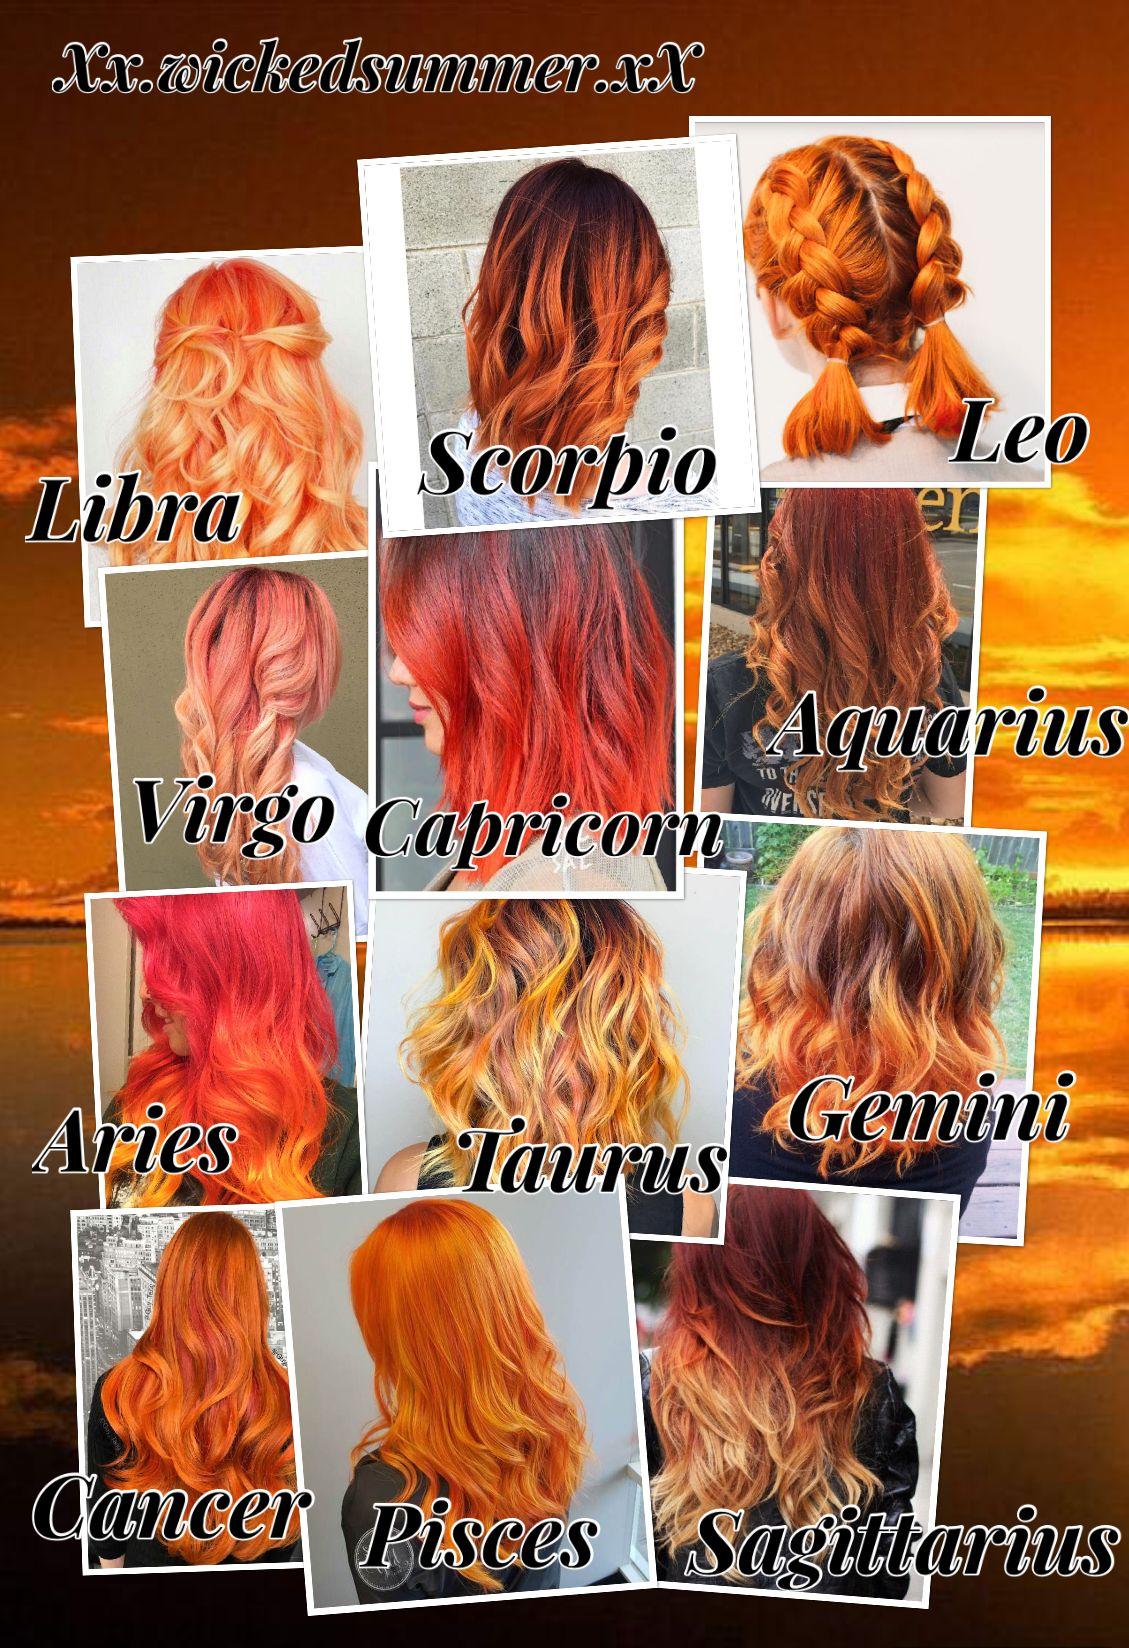 Hair Coloring Types Zodiac Signs Sagittarius Zodiac Signs Zodiac Signs Astrology